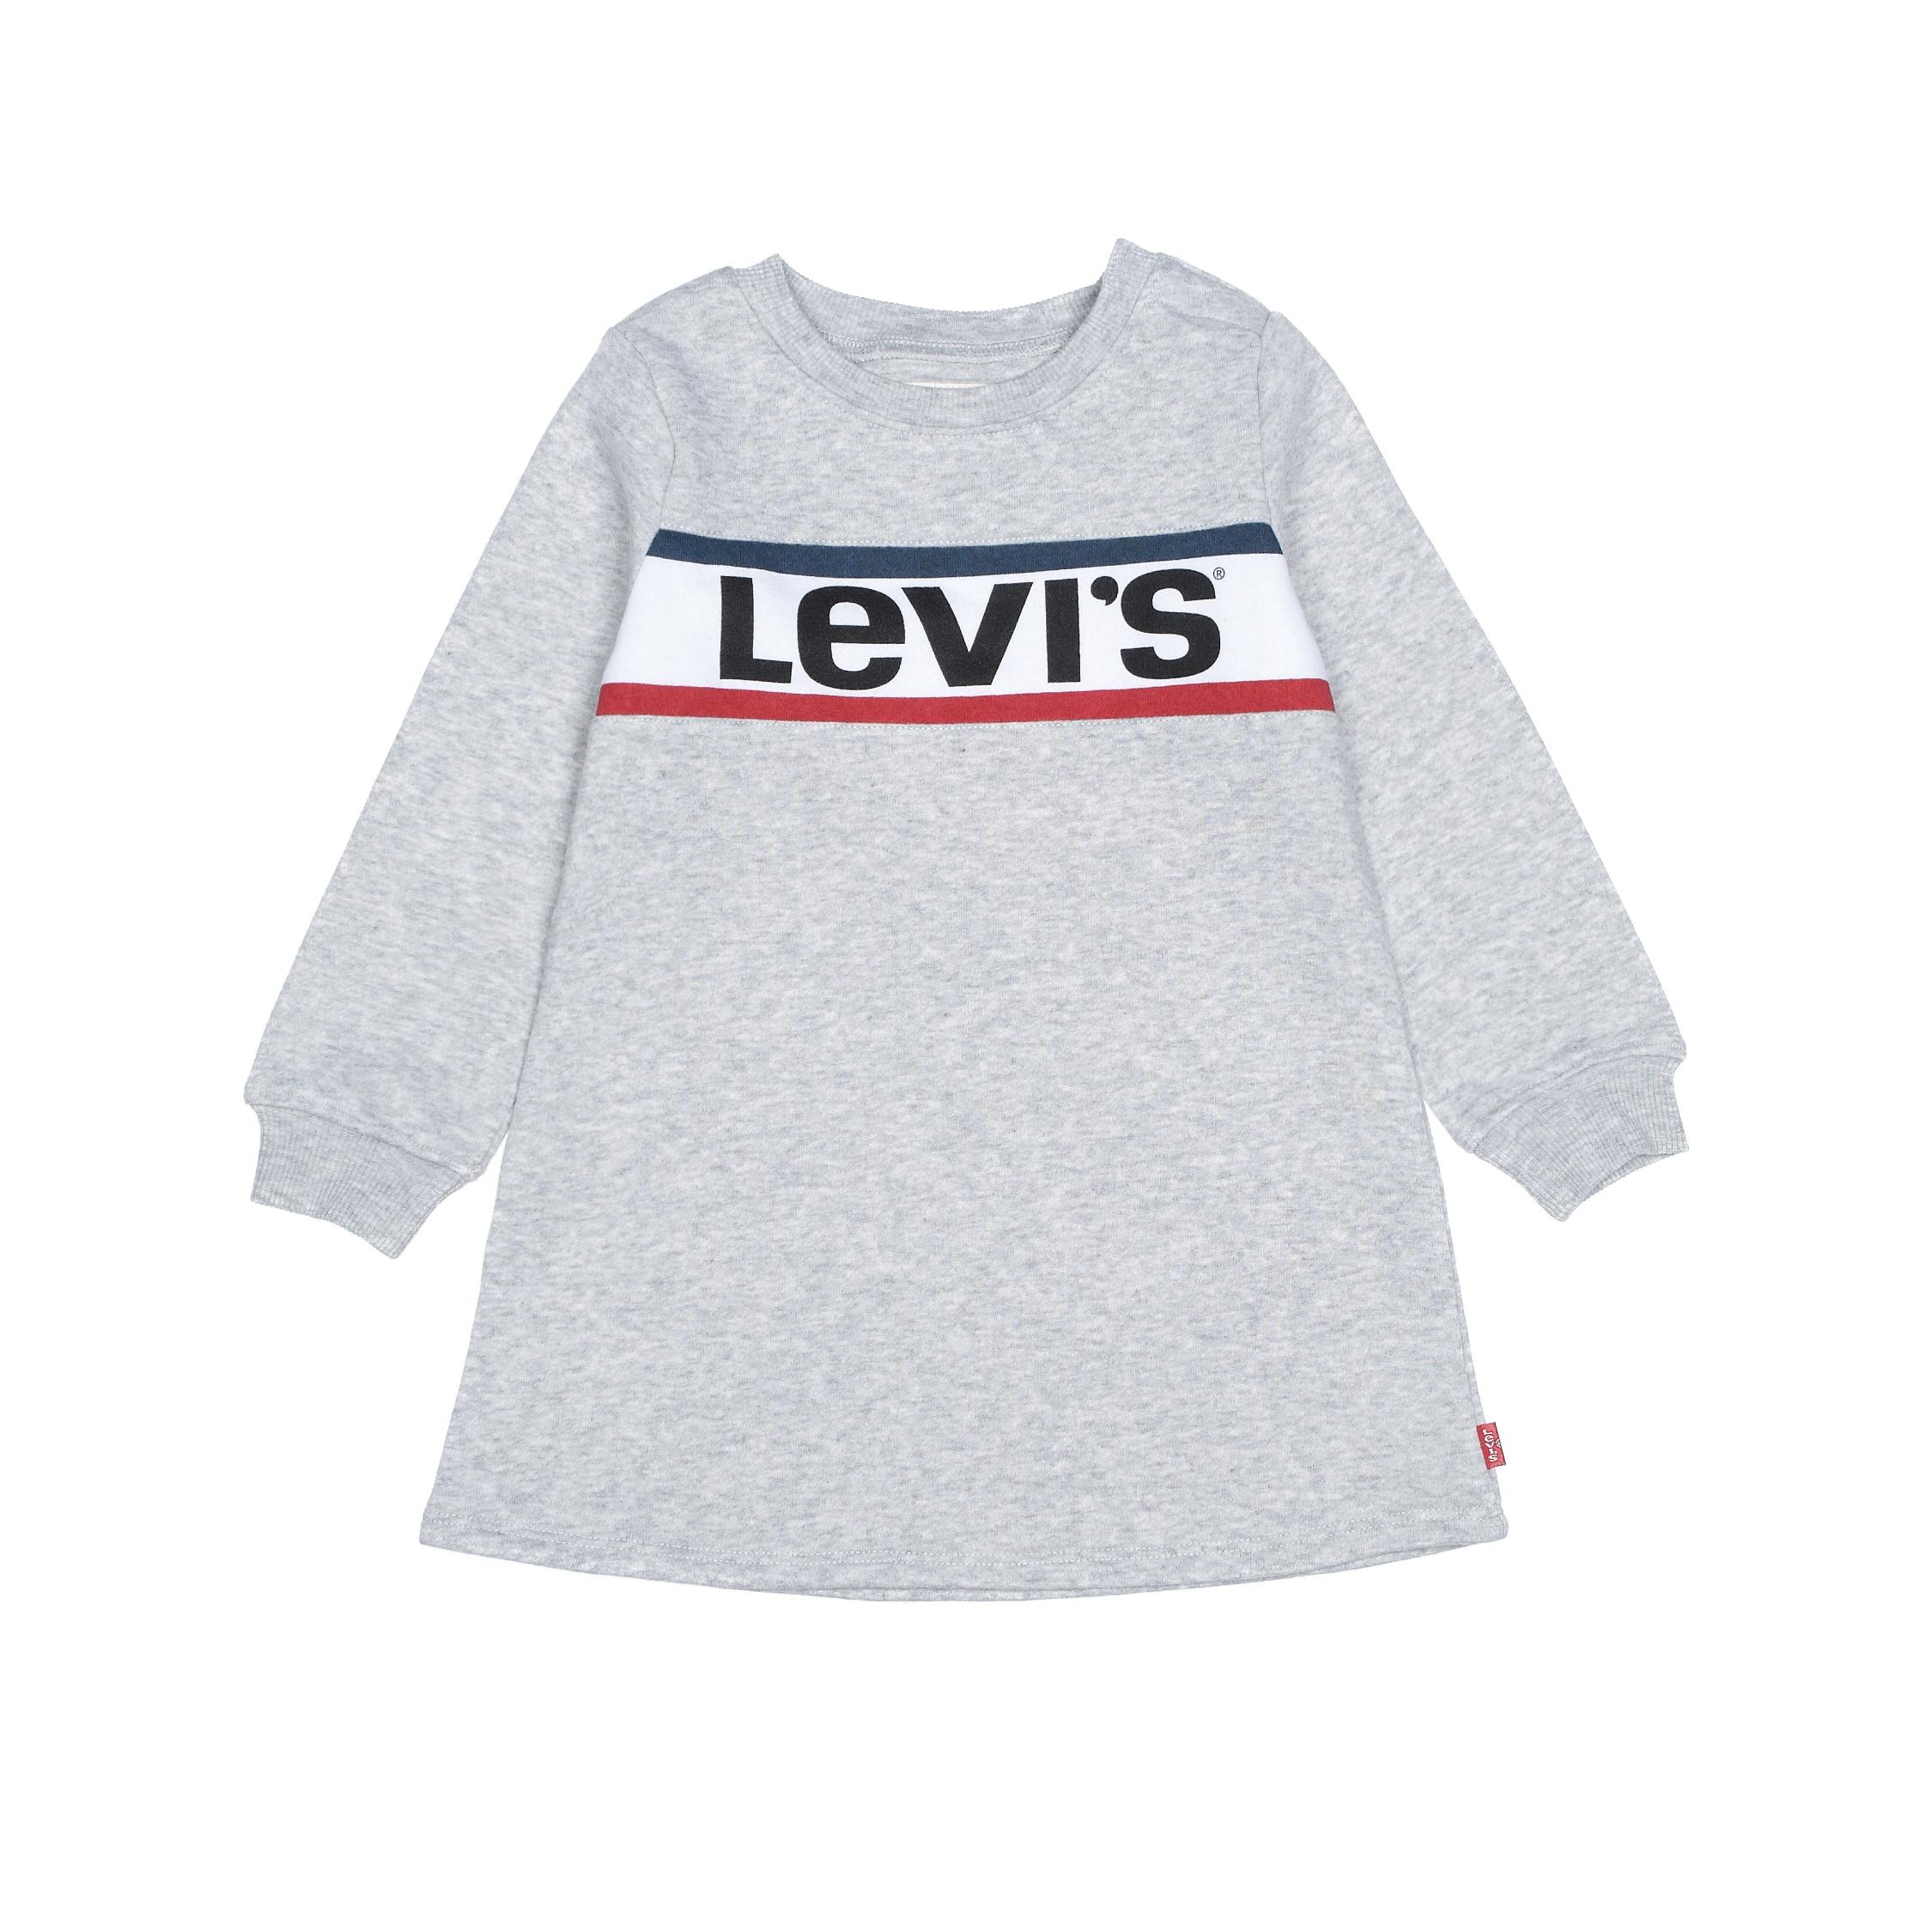 https://www.leadermode.com/200245/levi-s-kids-1ec203-g2h-light-grey-heat.jpg